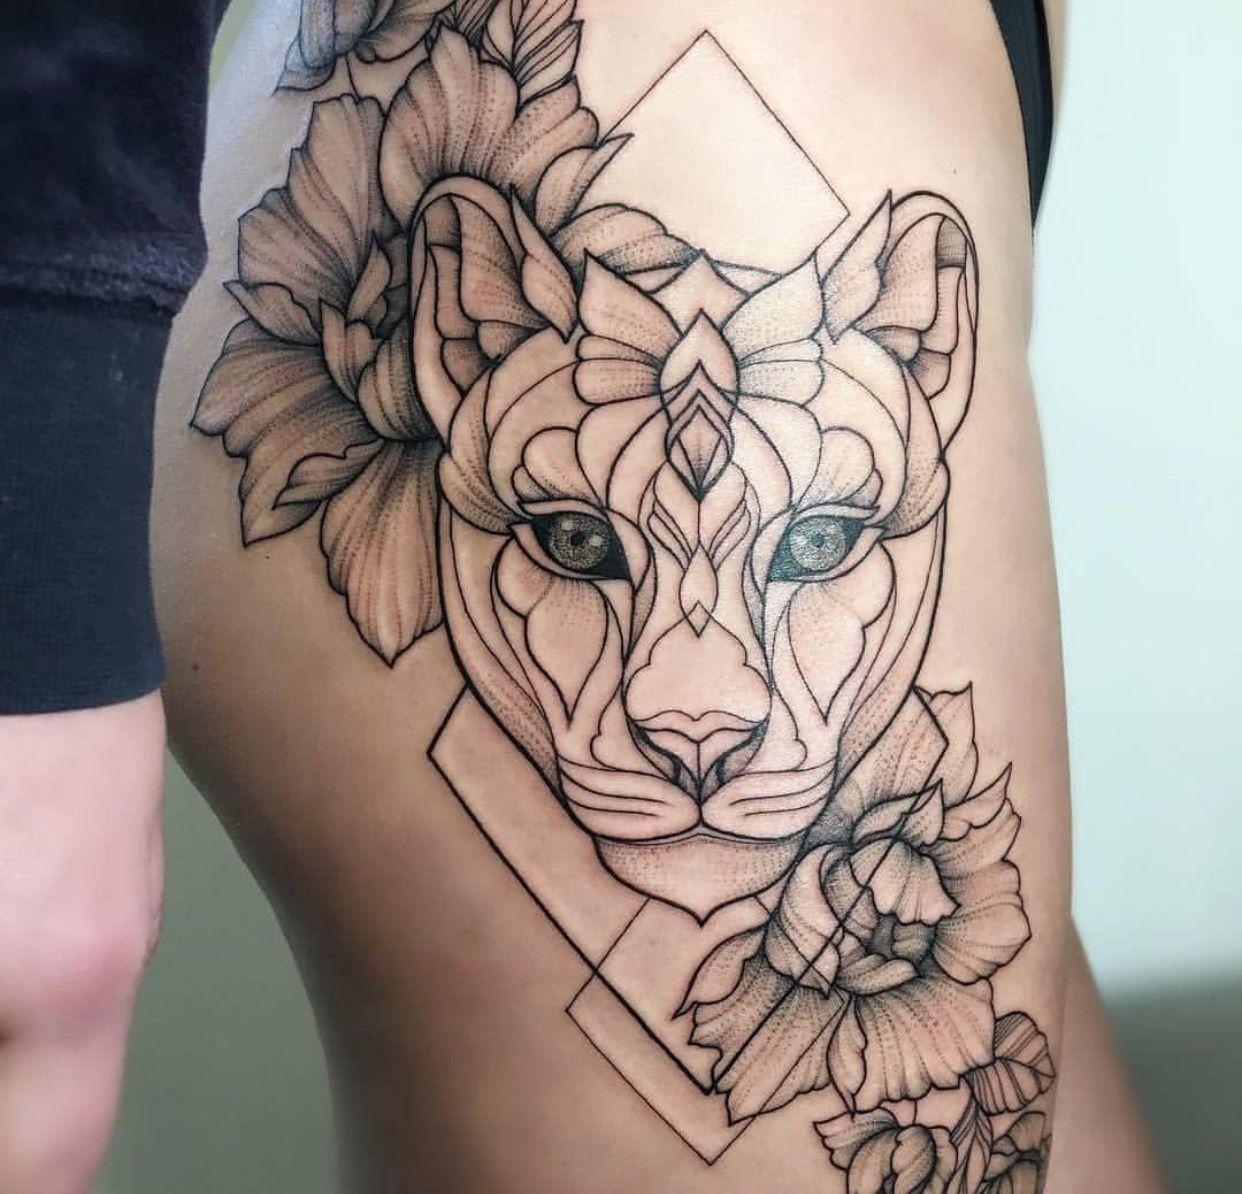 Pin by Jomahira Velez on tattoos Leg tattoos women